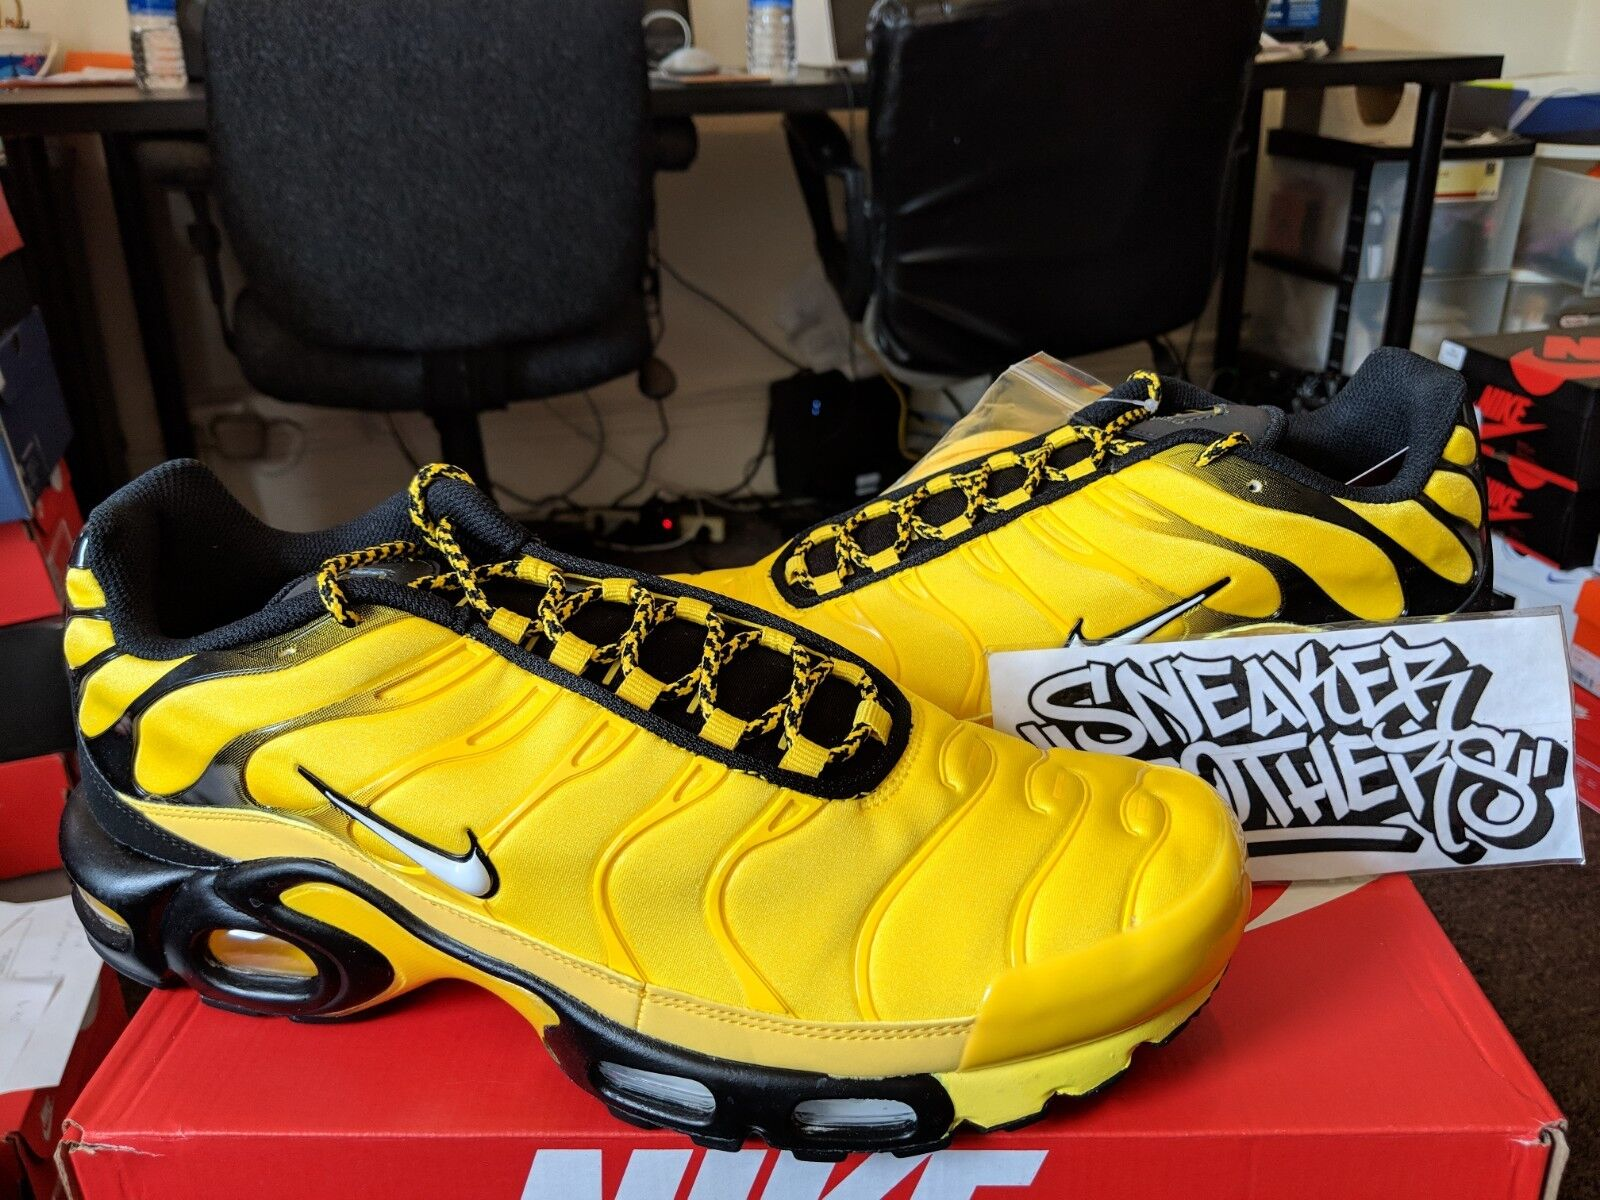 bf988f94b39a78 Спортивная обувь для мужчины Nike Air Max Plus TN Tuned Frequency Pack Tour  Yellow Black White Men AV7940-70 - 323446427332 - купить на eBay.com (США)  с ...